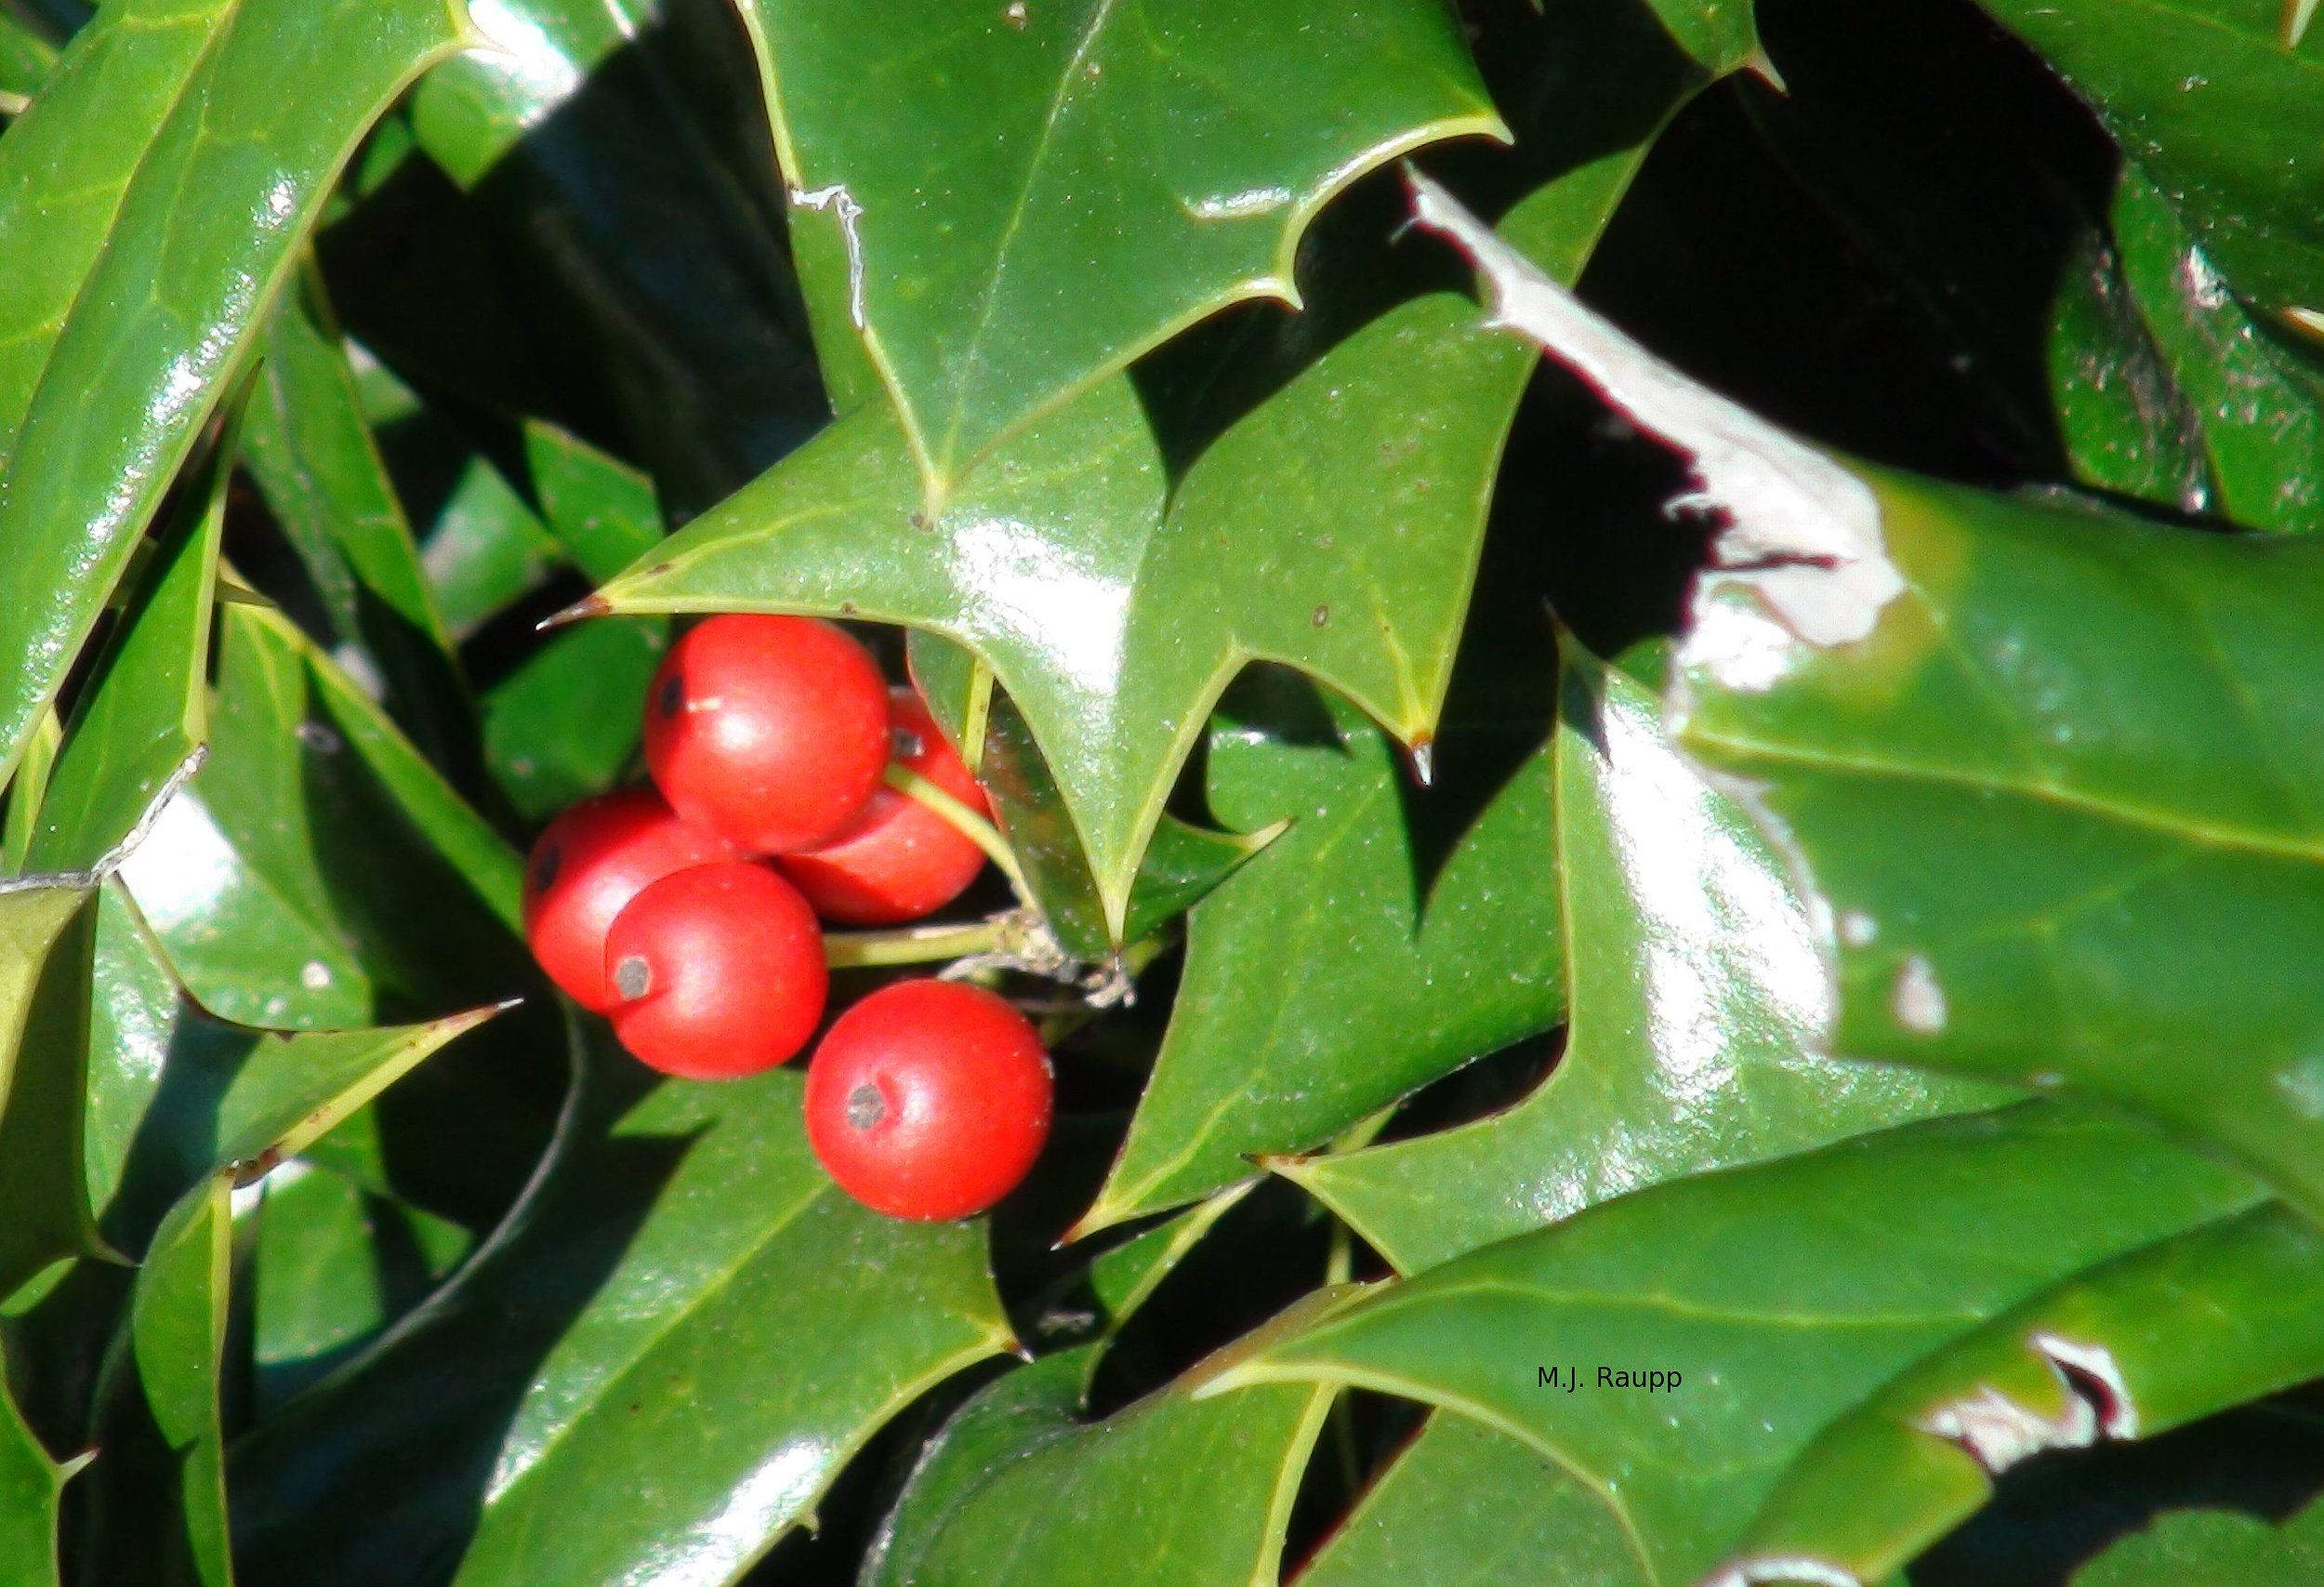 Beneath the hollies' leaves are decorative surprises.